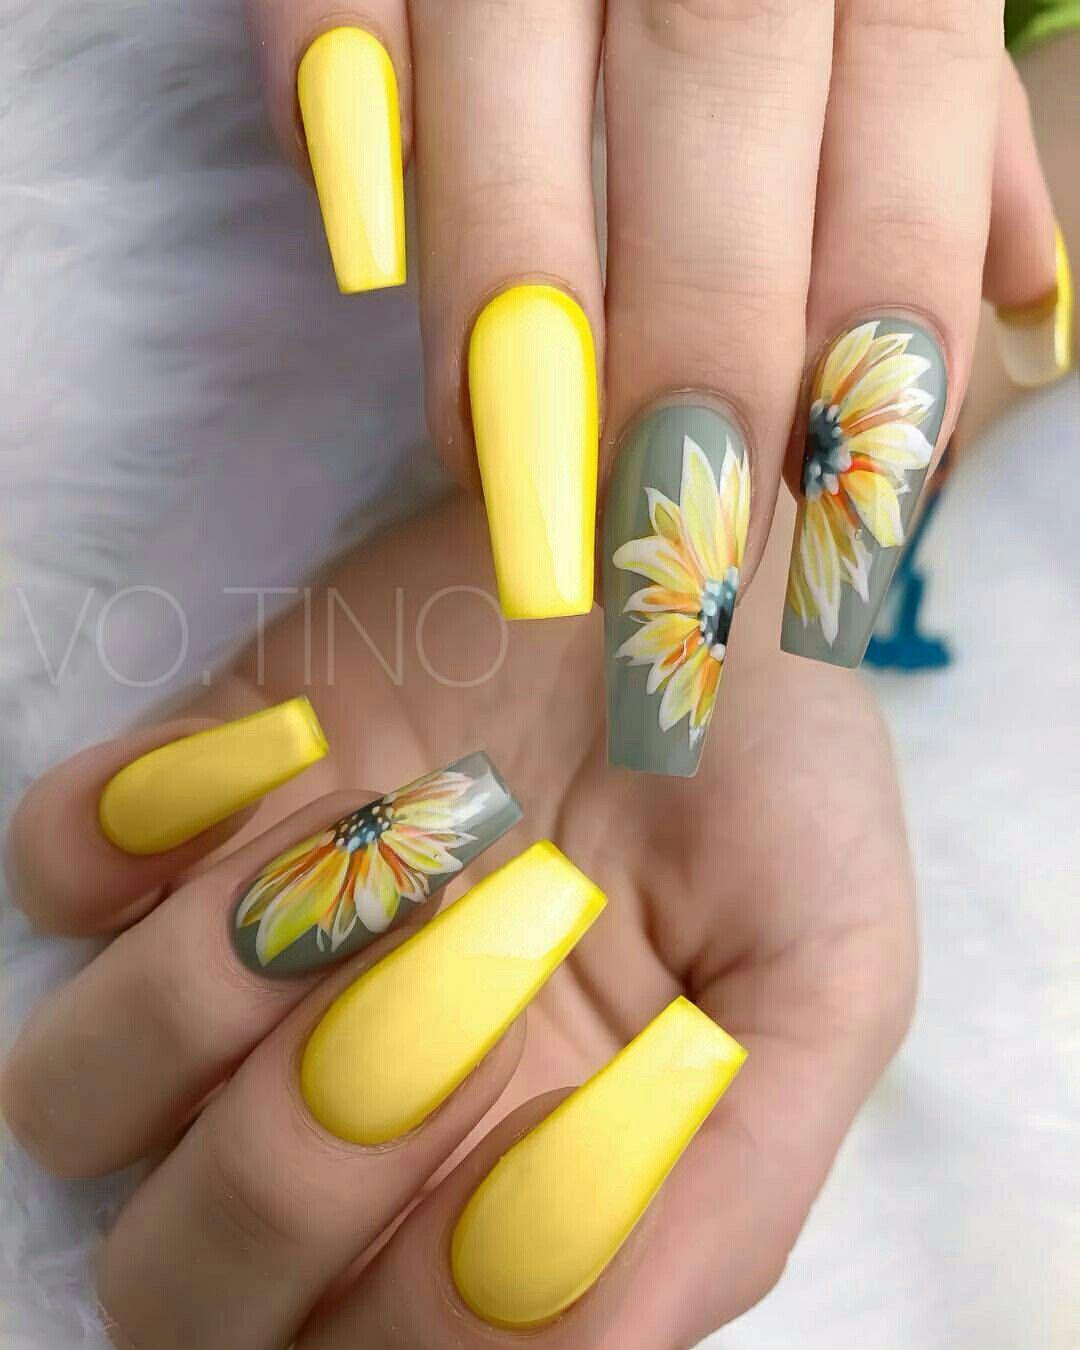 Spring Flowers Nail Art Design #nails #nailartdesign #springnails Nails In 2019